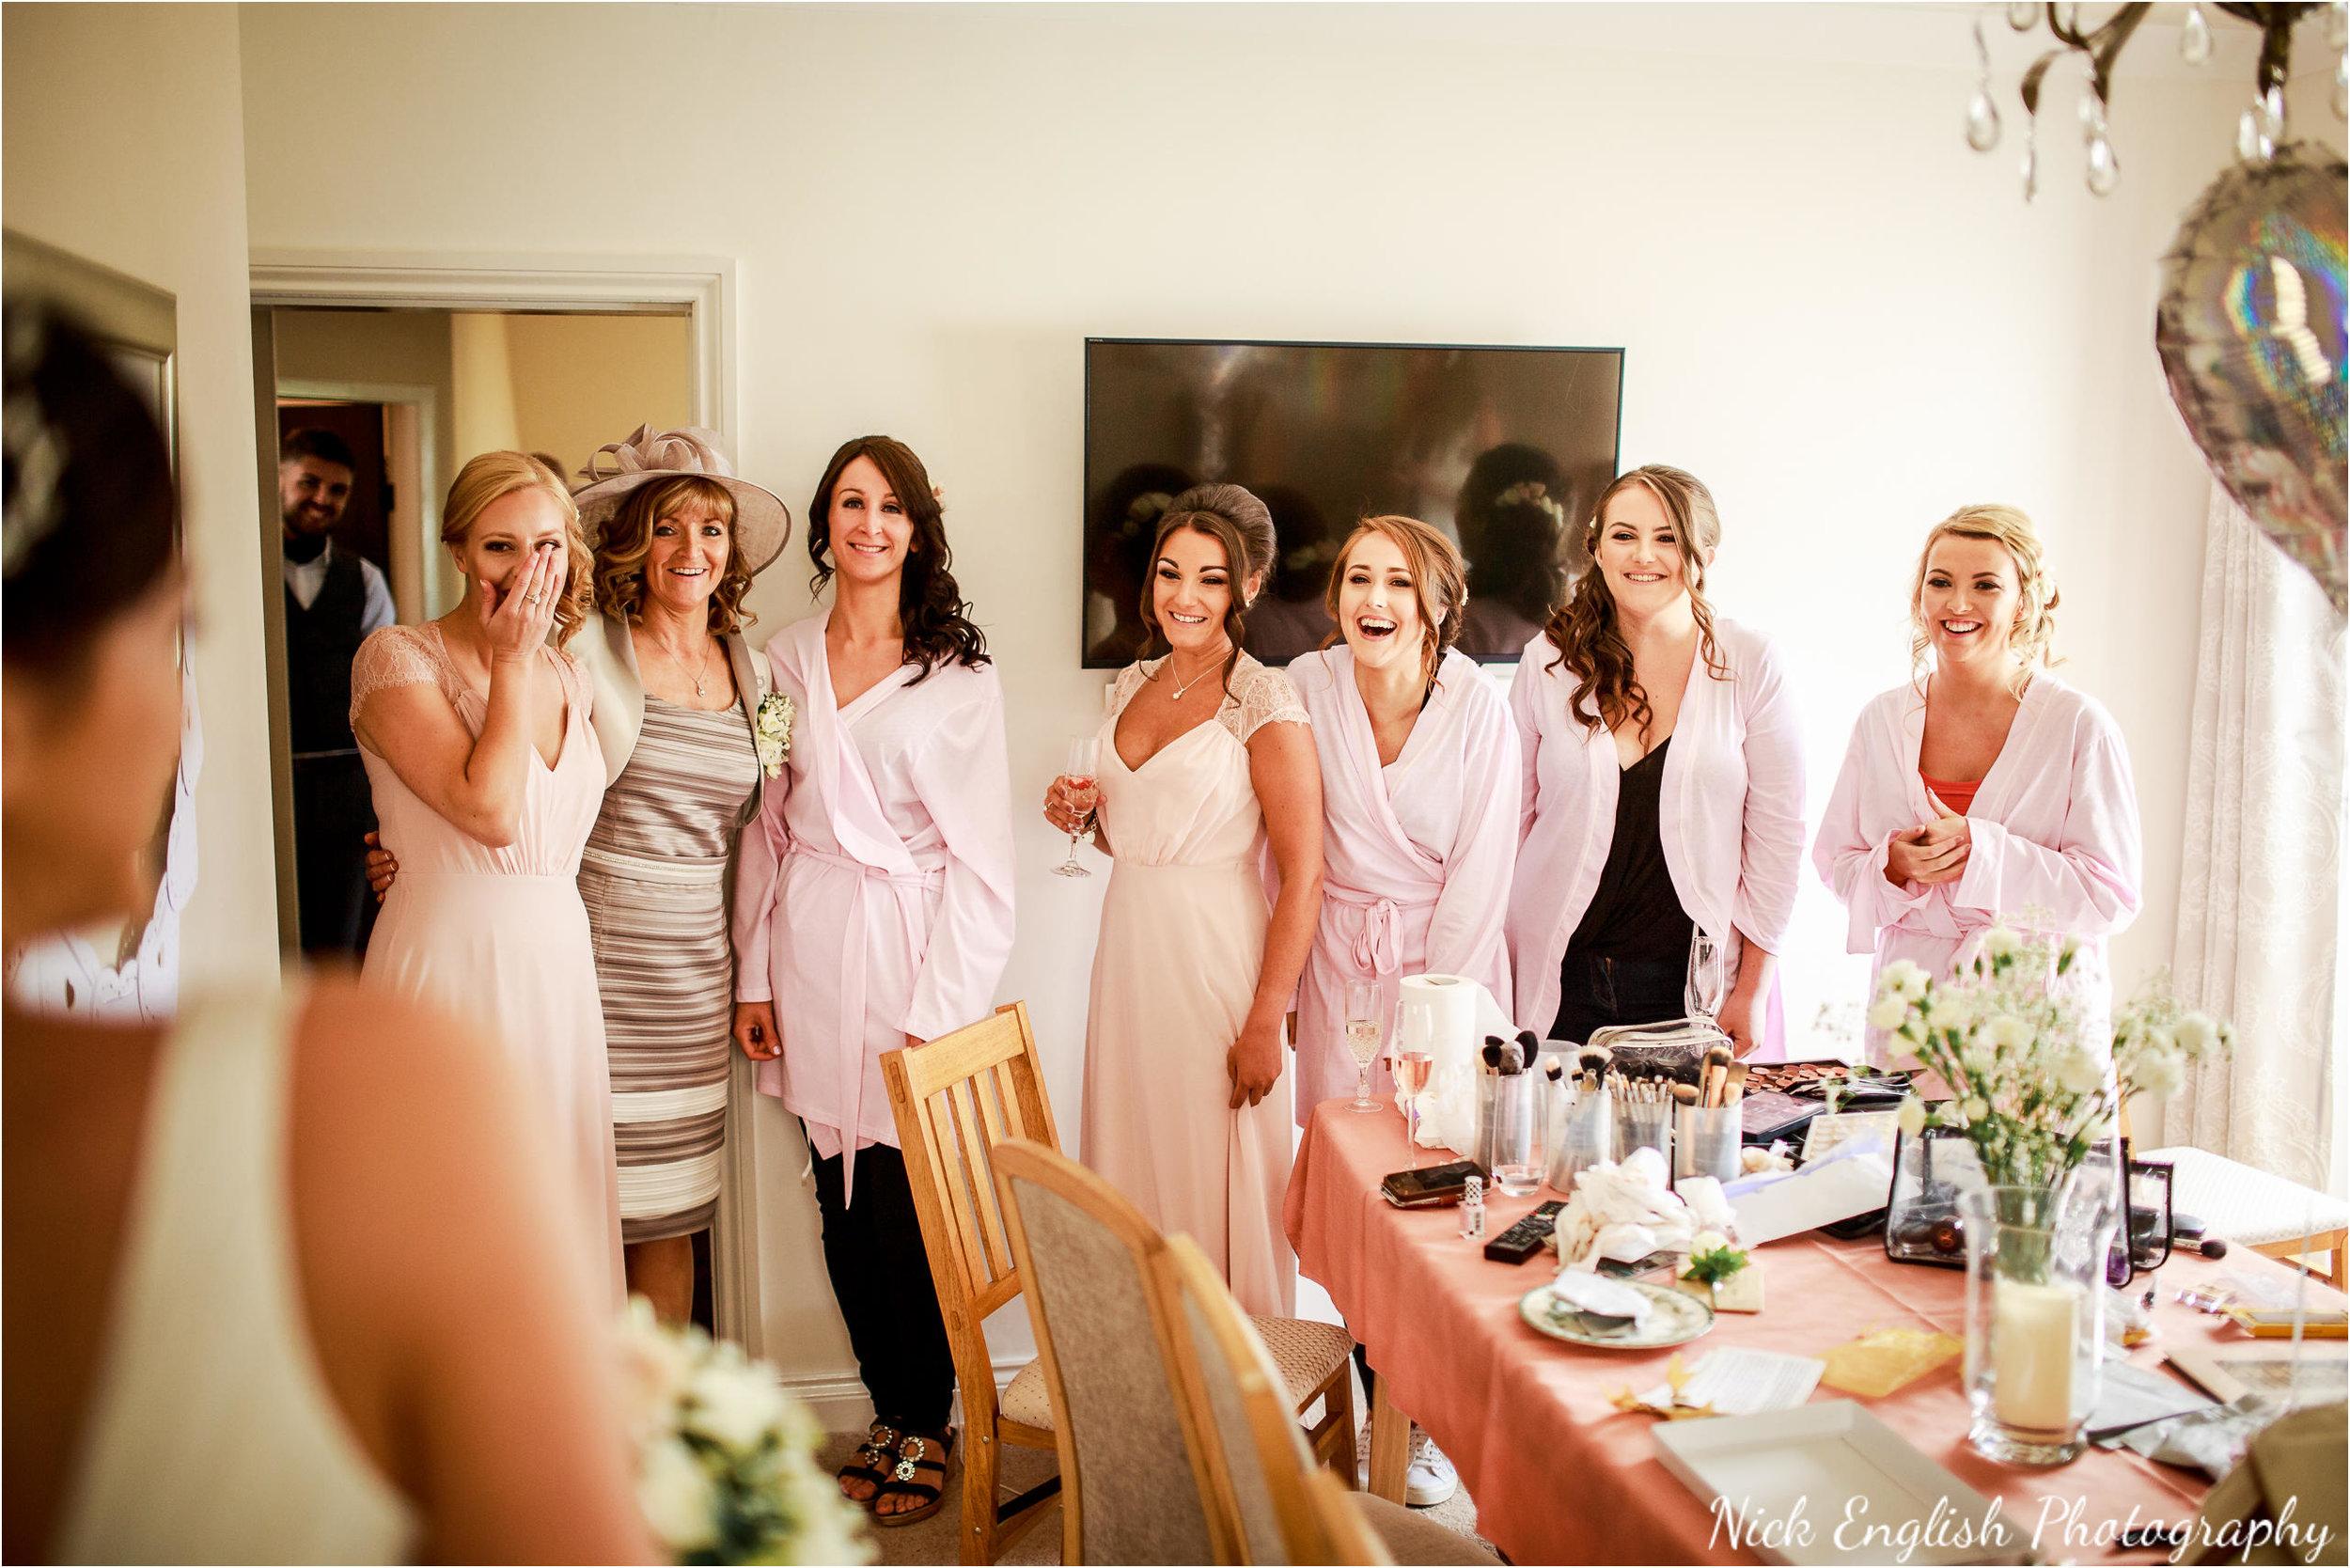 Emily David Wedding Photographs at Barton Grange Preston by Nick English Photography 42jpg.jpeg